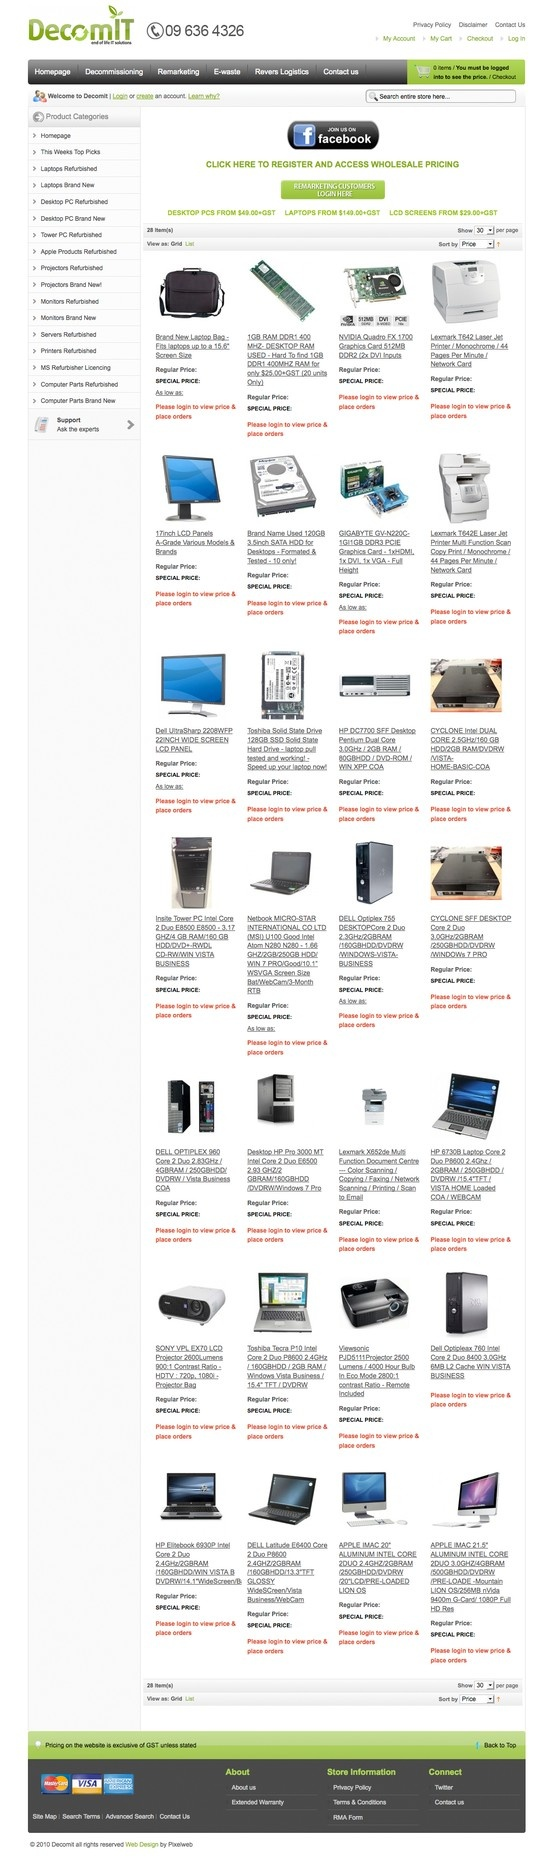 Decom IT Refurbished Computer Store built in Magento eCommerce